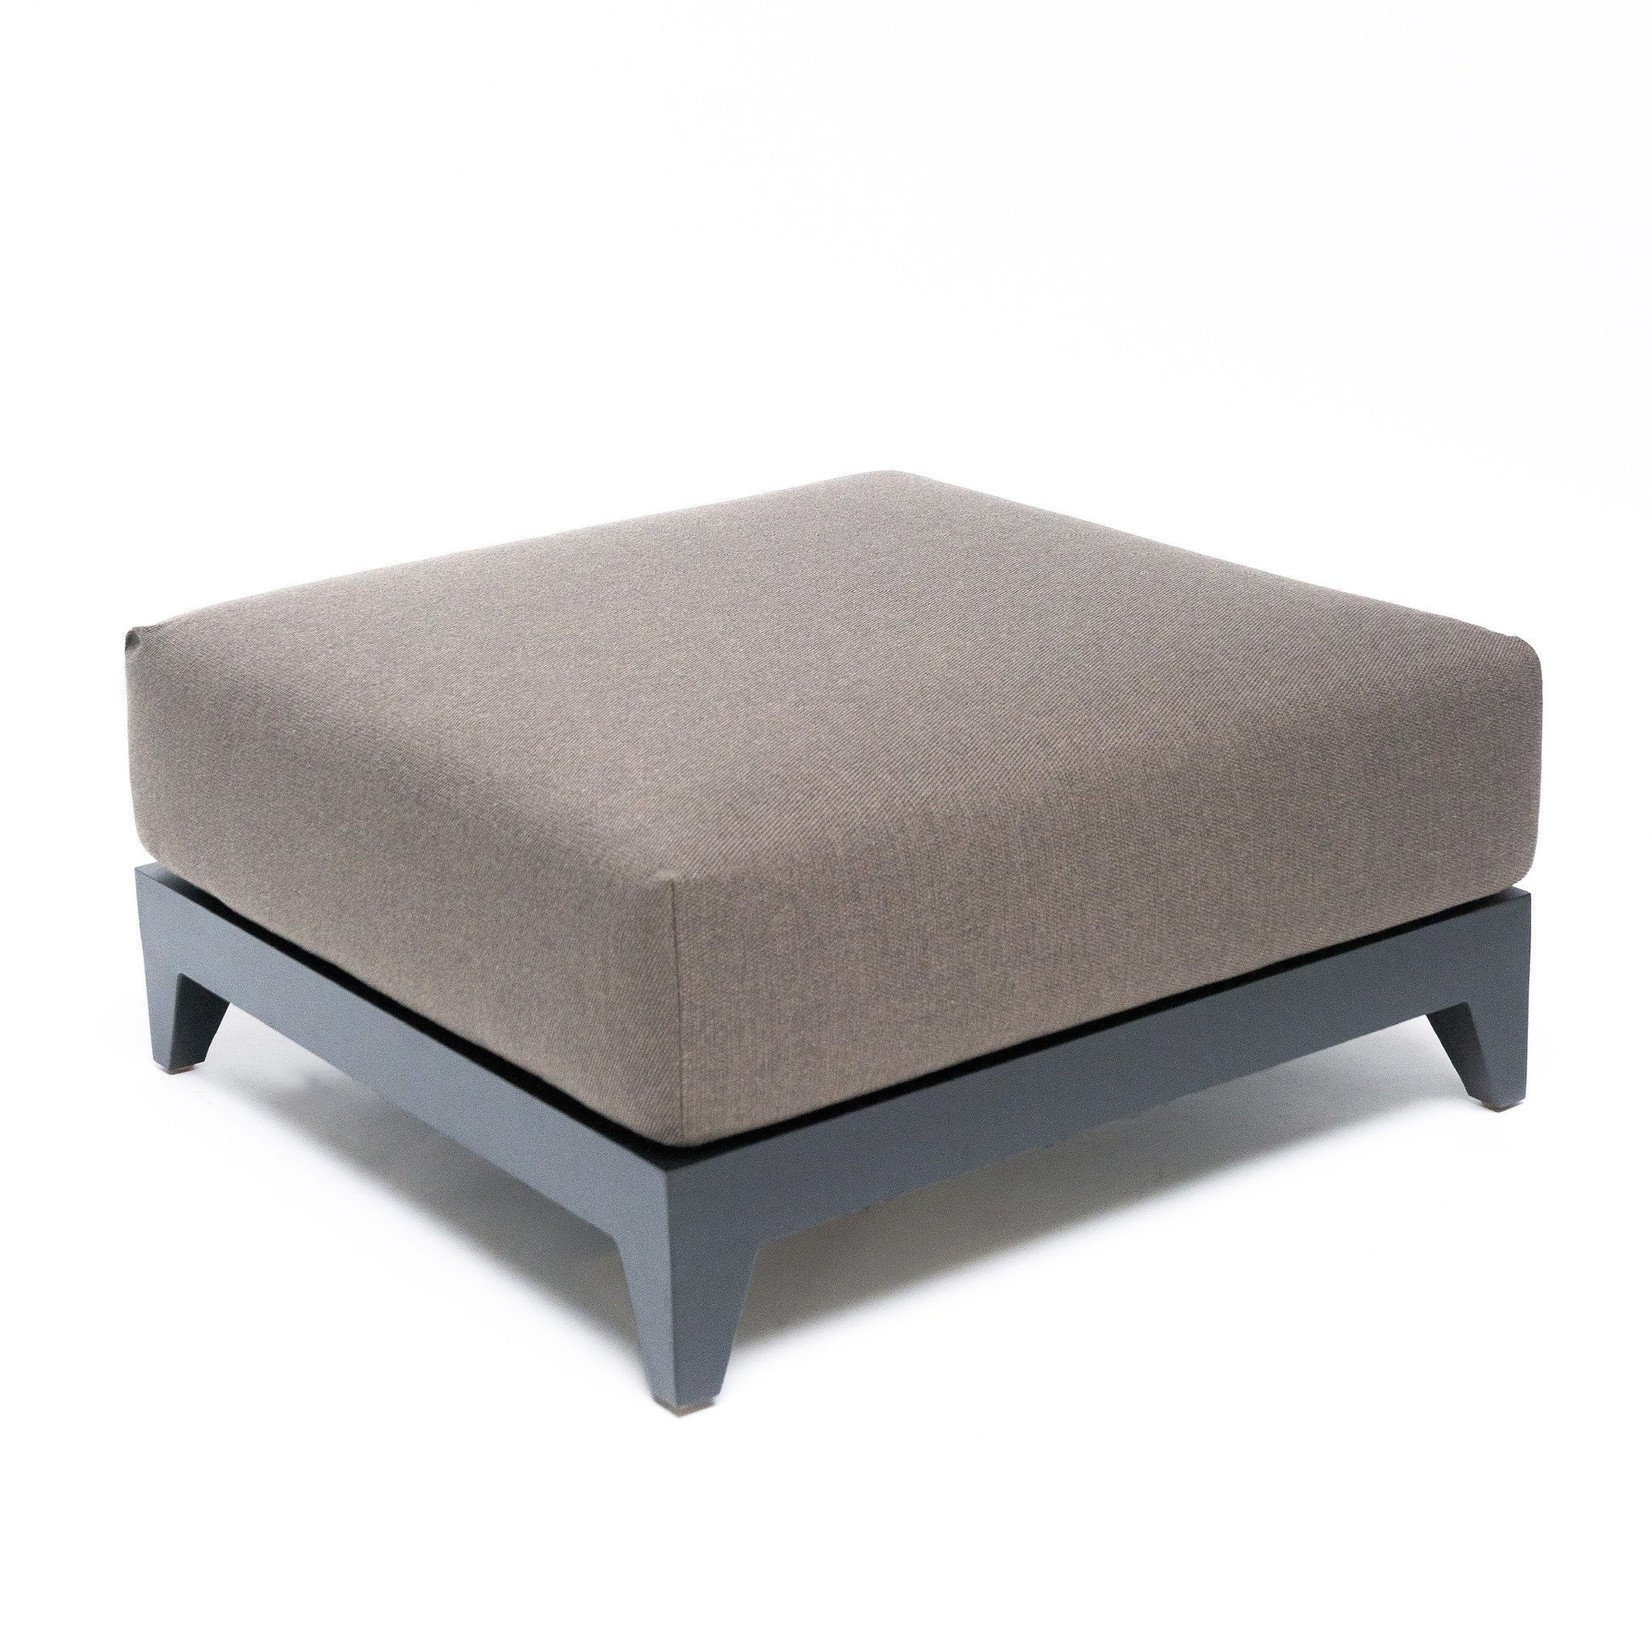 Gommaire Ottoman Mia | Aluminum Matte Black + Cushion